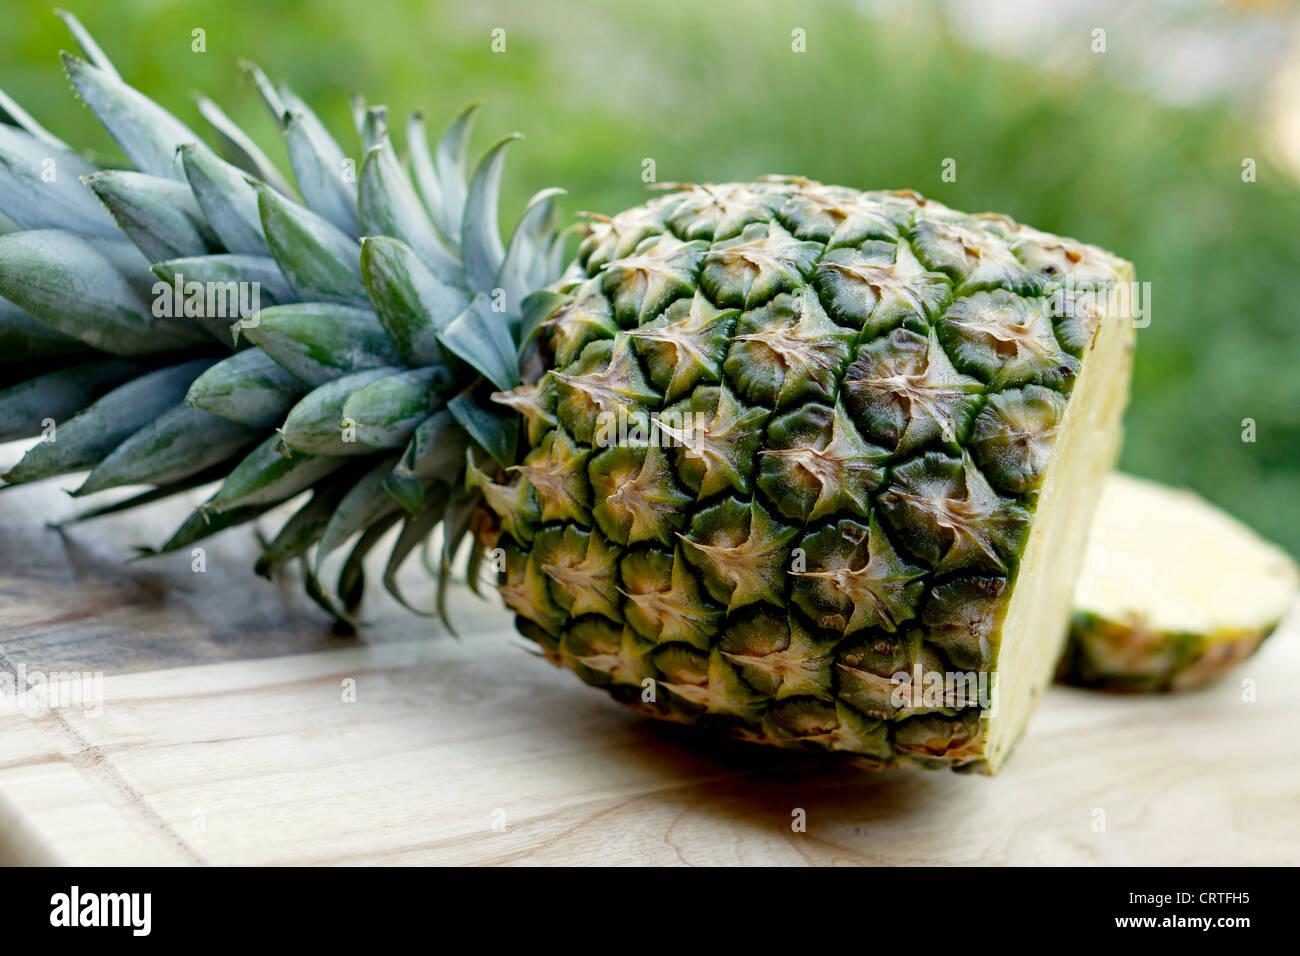 Pineapple Sliced, Ananas Cut - Stock Image